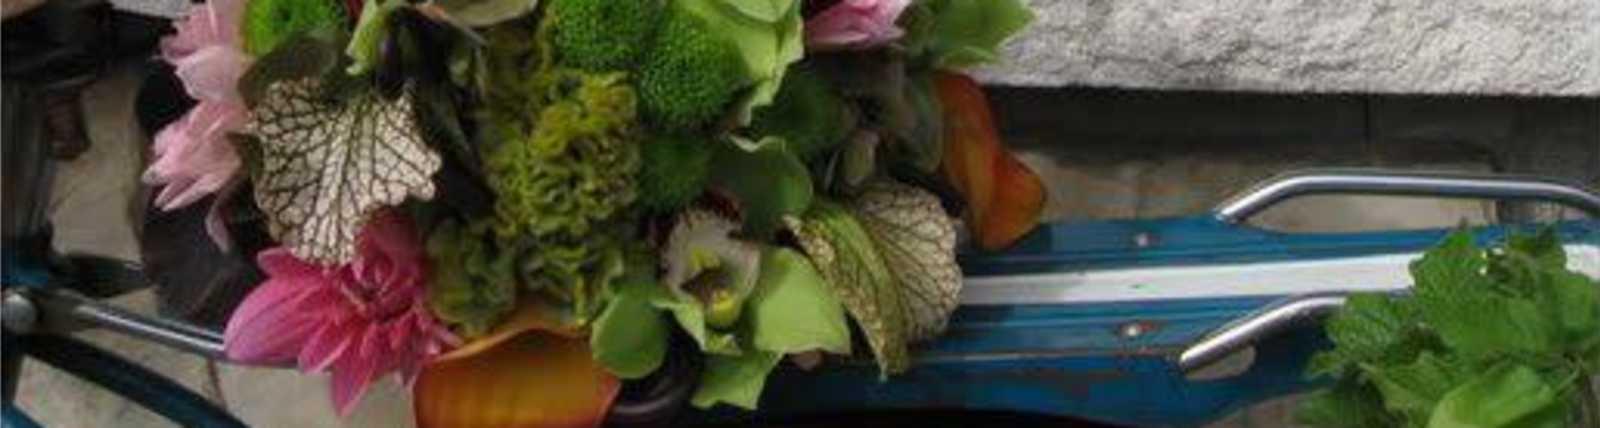 Flora_Laura__Marine_View_Florist_.jpg